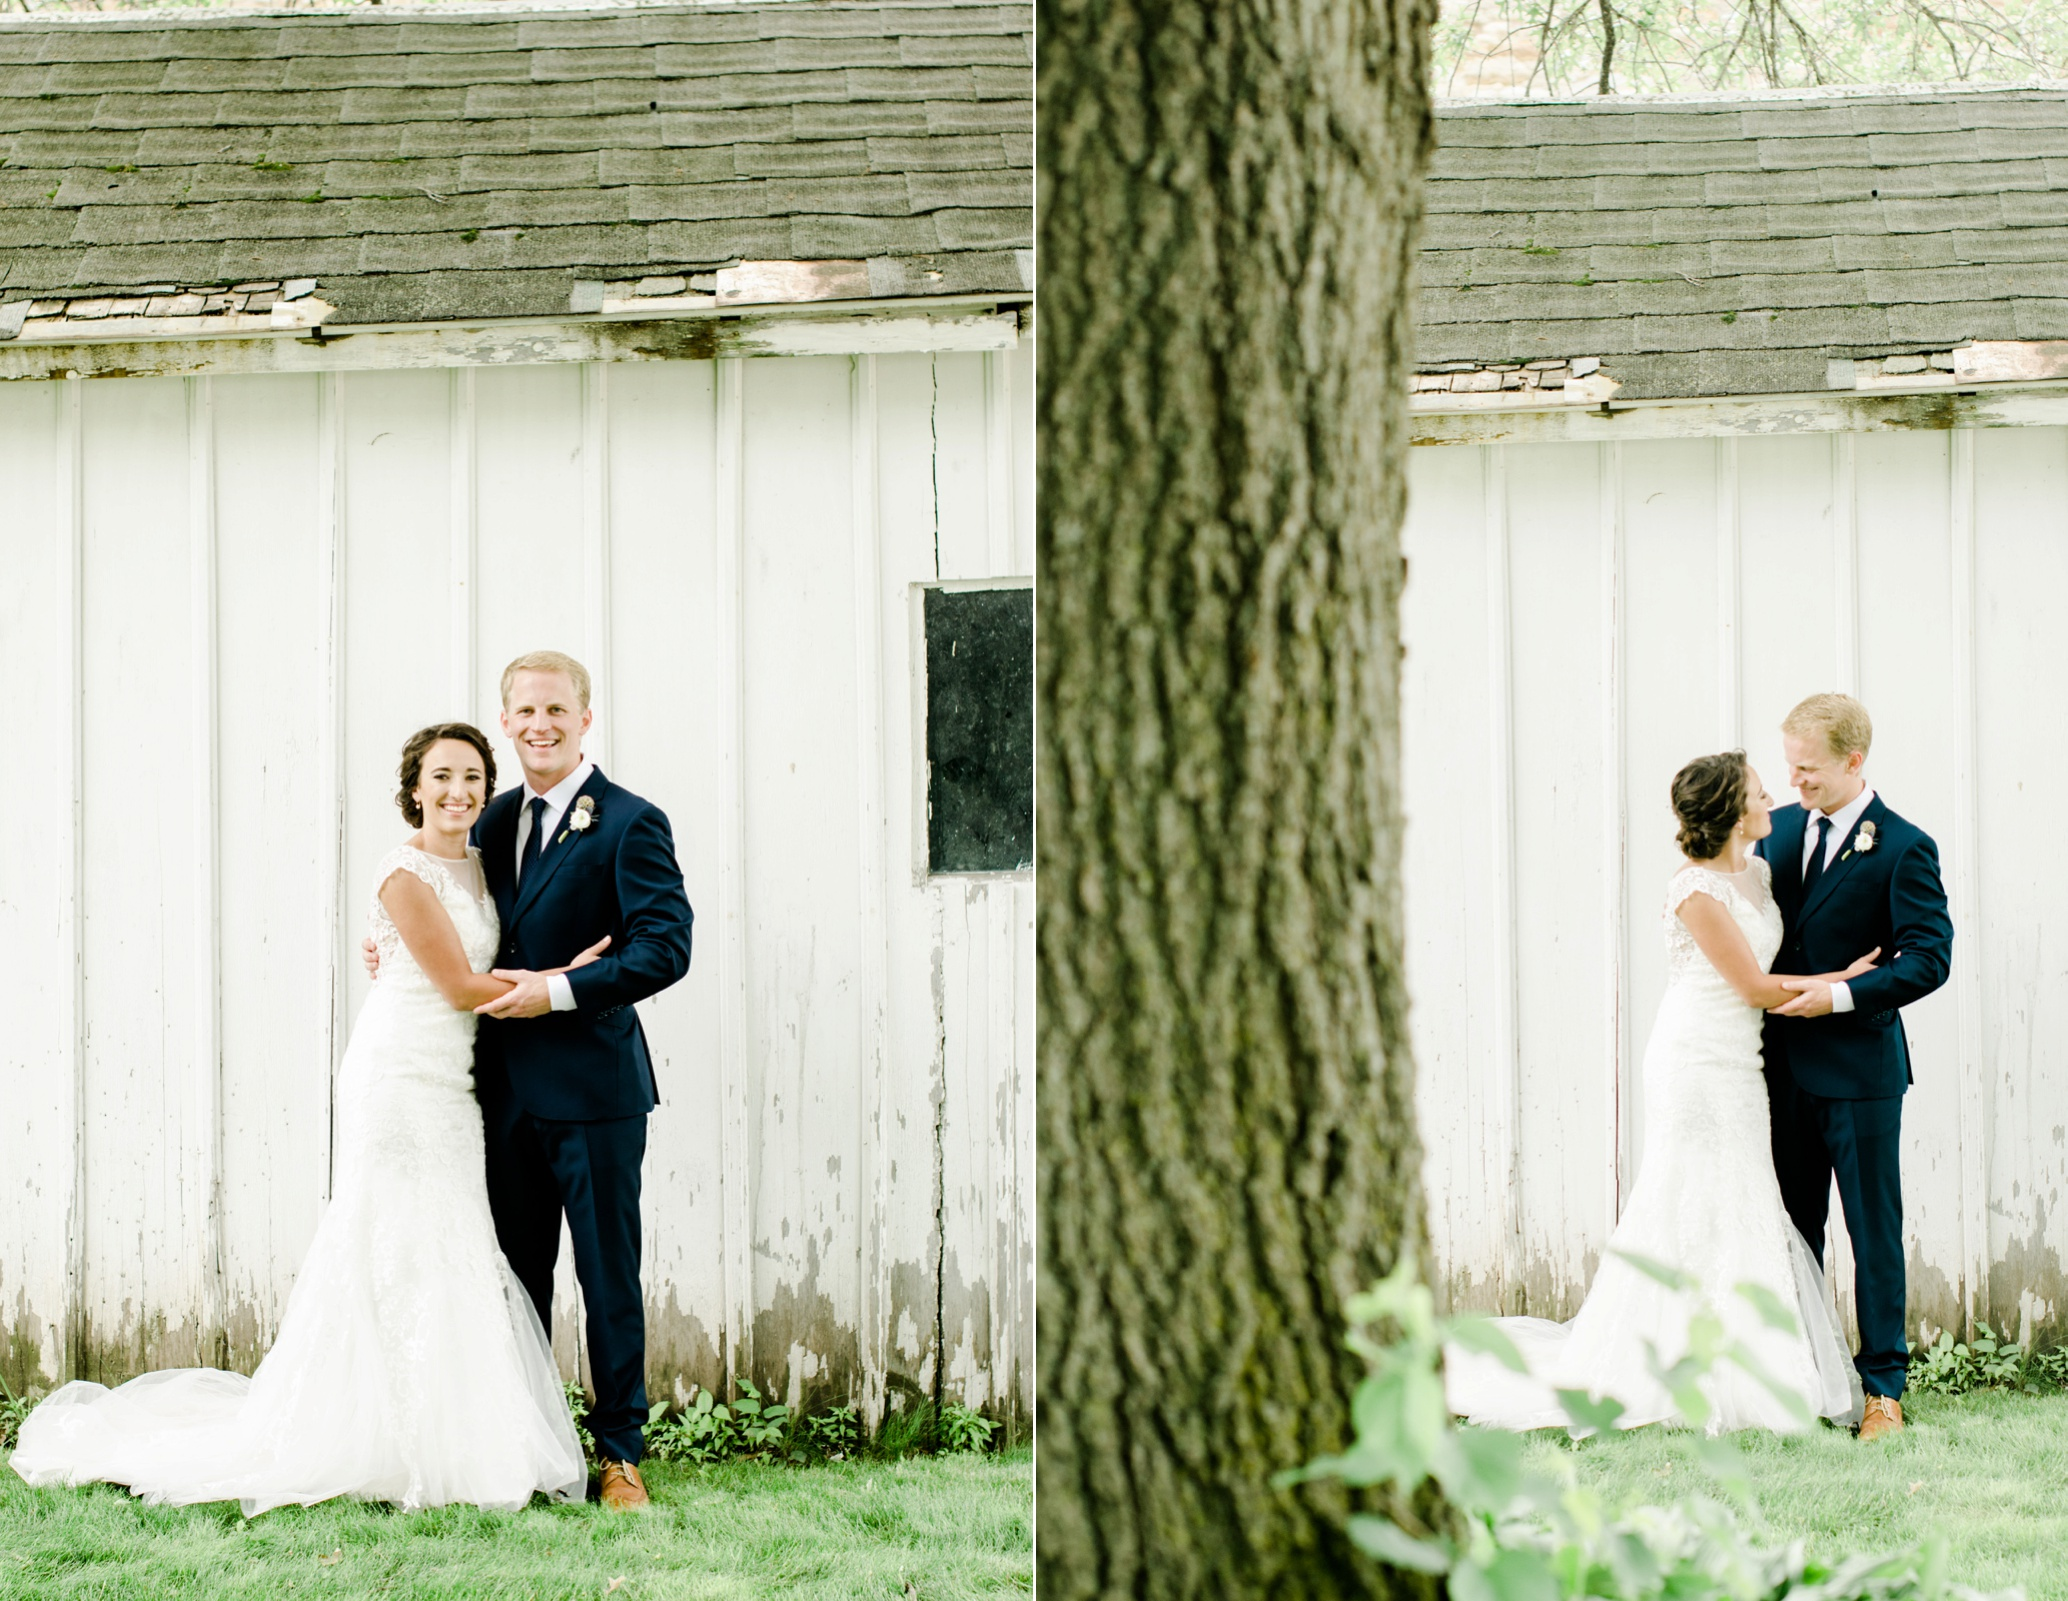 Palmer House and Stable Solon, IA | Ali Leigh Photo Minneapolis Wedding Photographer_0243.jpg